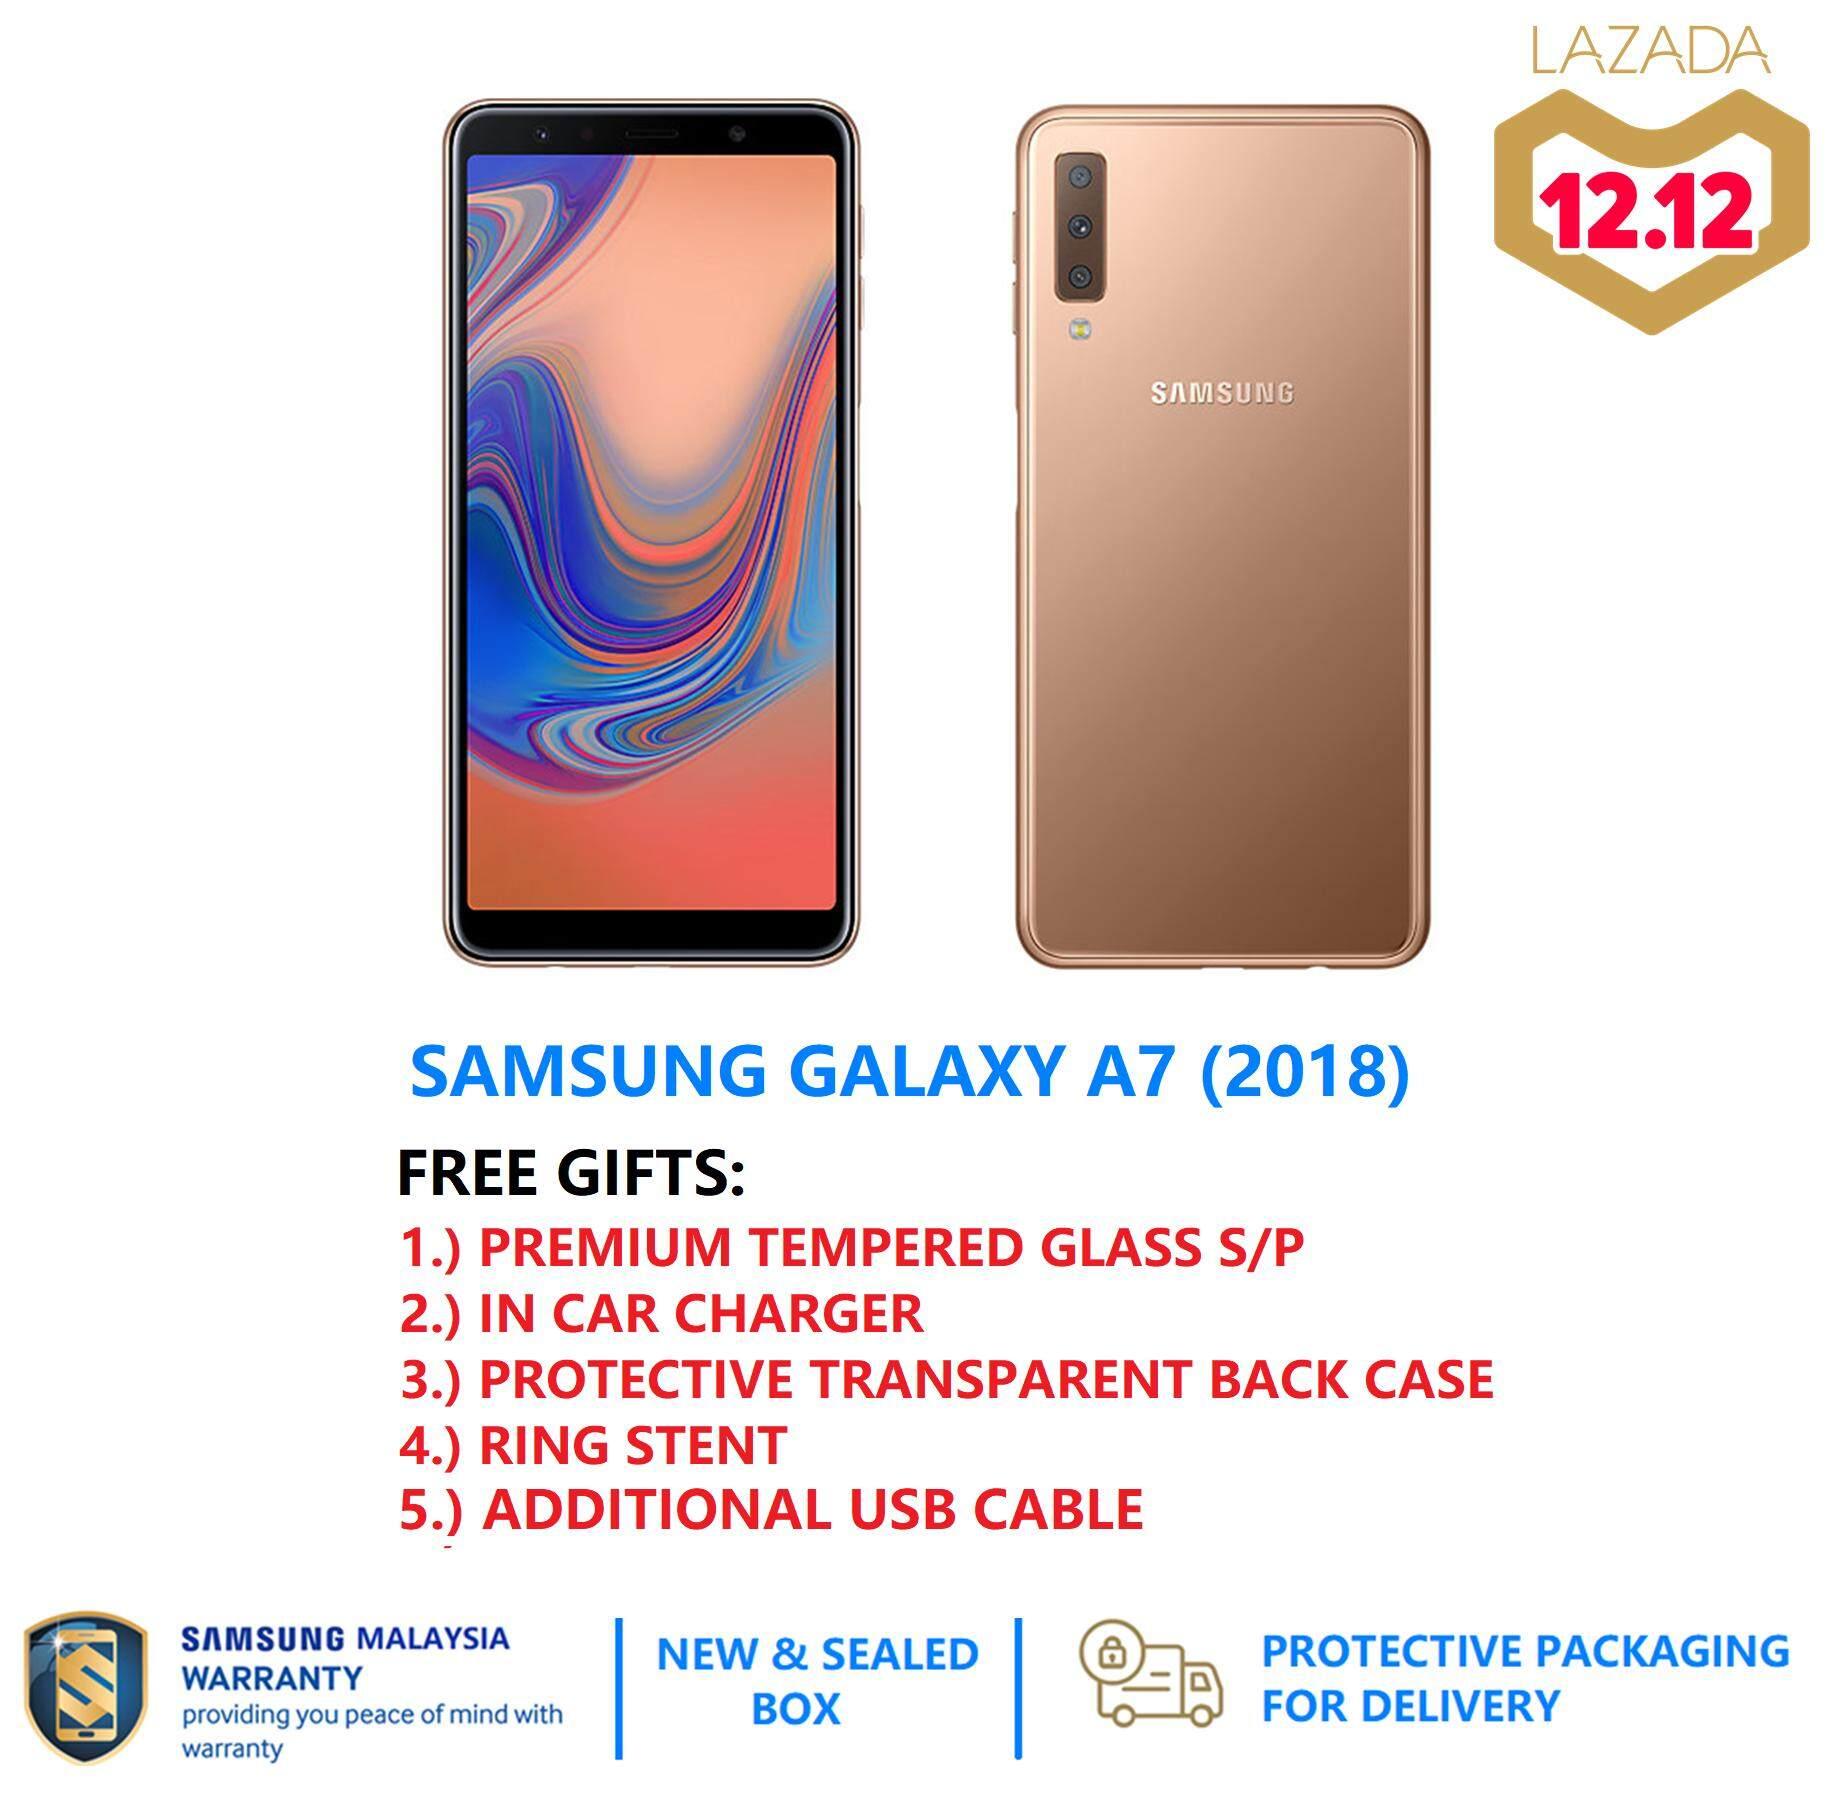 Grab Original Samsung Mobiles Tablets On Lazada My Galaxy J7 Lte 16gb Hitam Free Gifts A7 2018 3x Camera Lens 4gb